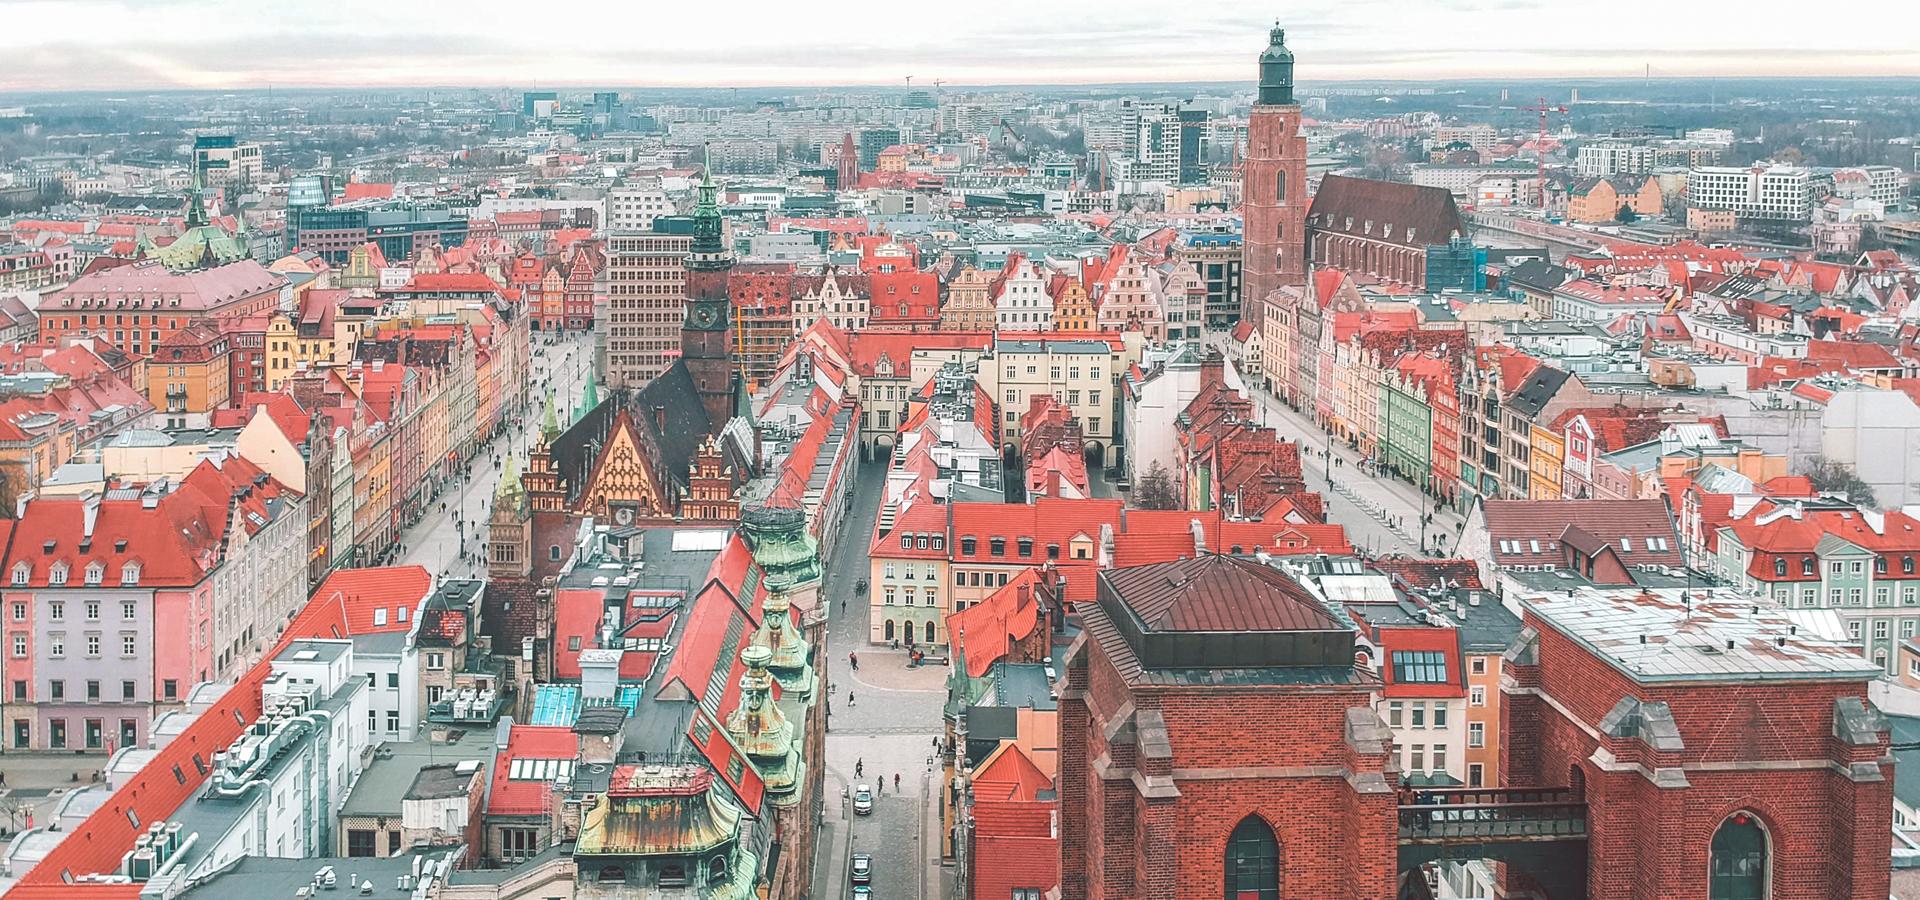 Peer-to-peer advisory in Wrocław, Poland